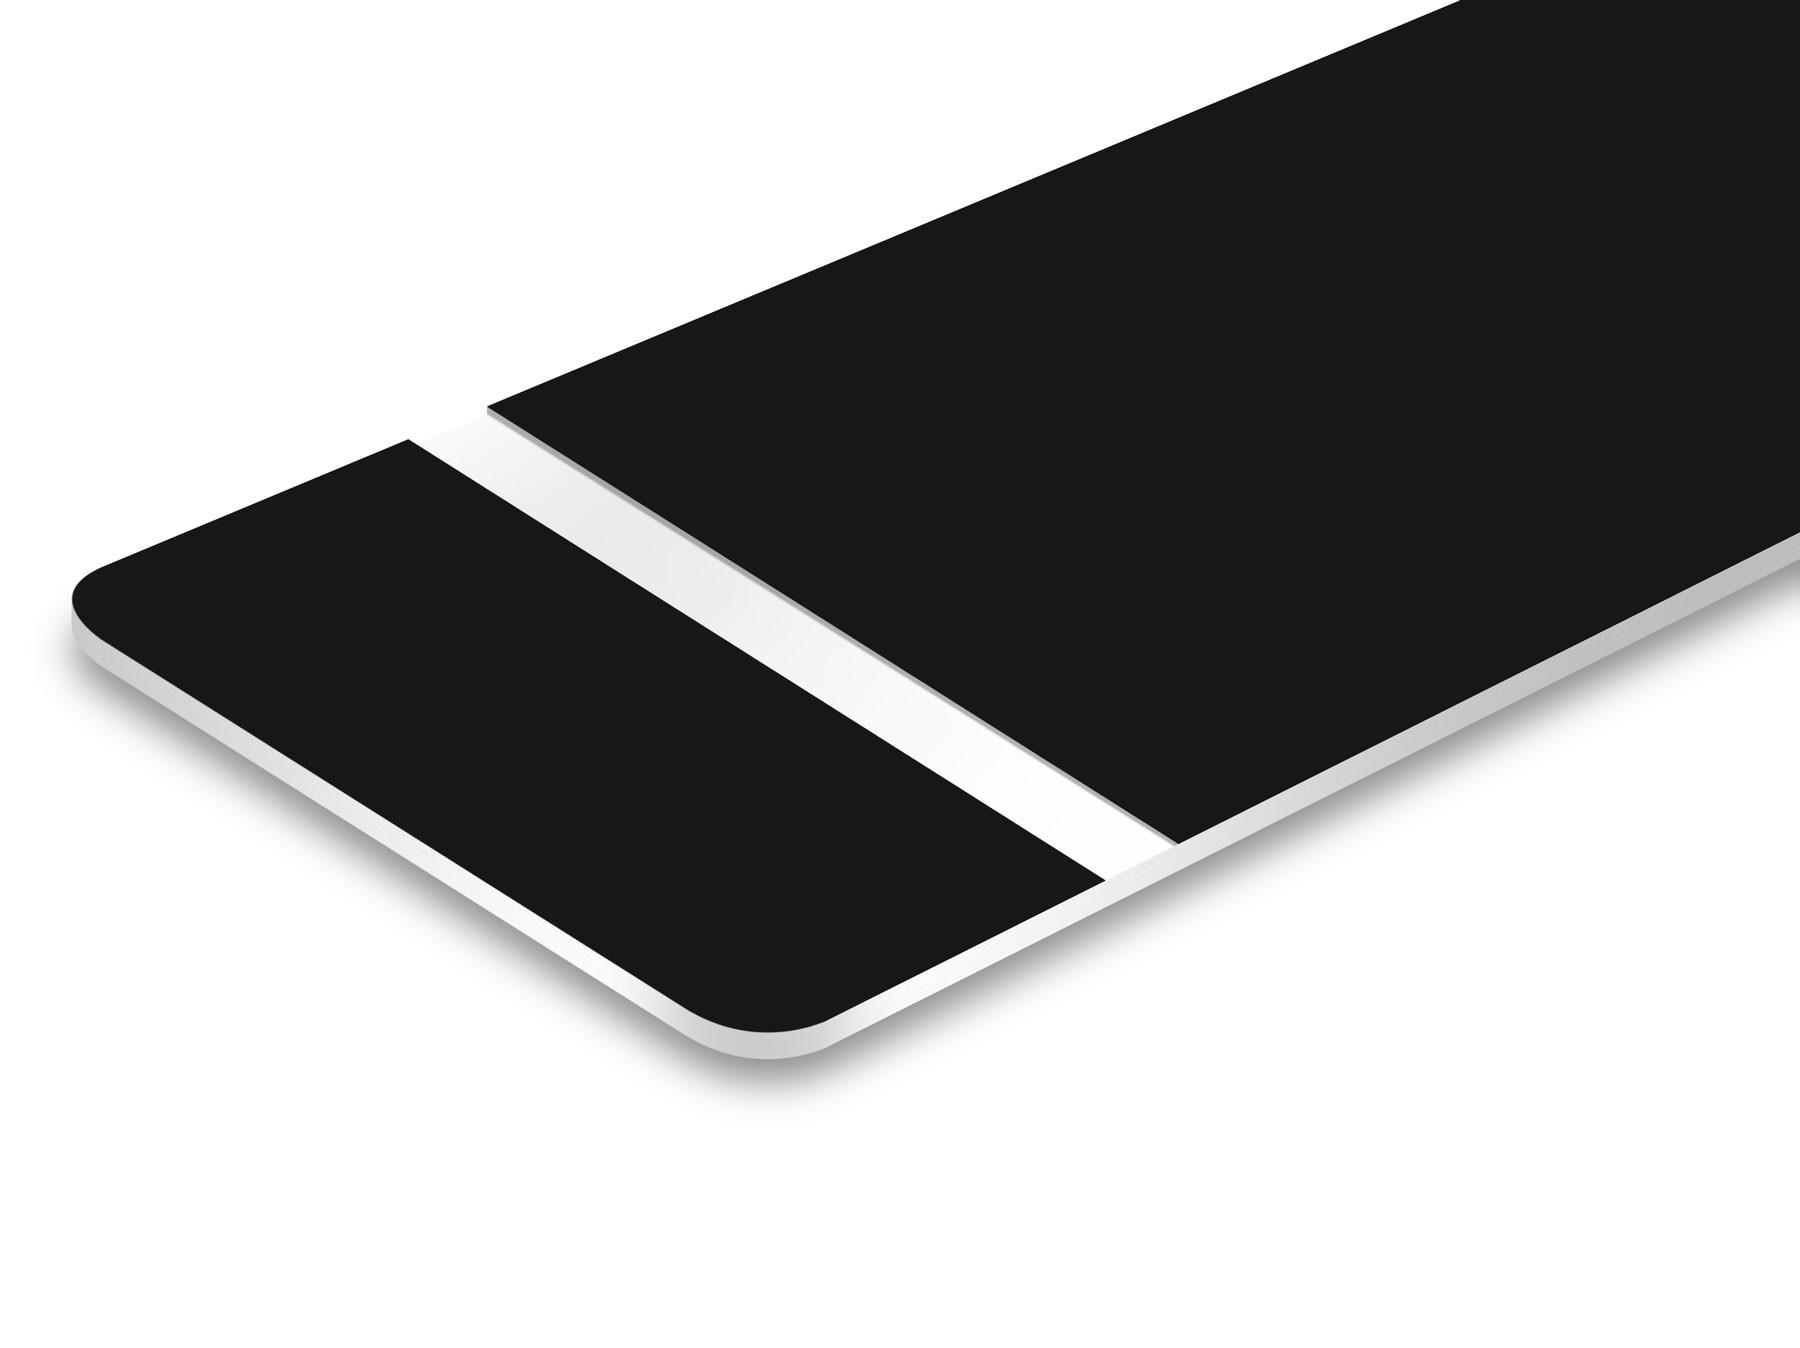 TroLase Lights, Black/White, 2ply, 0.1 mm